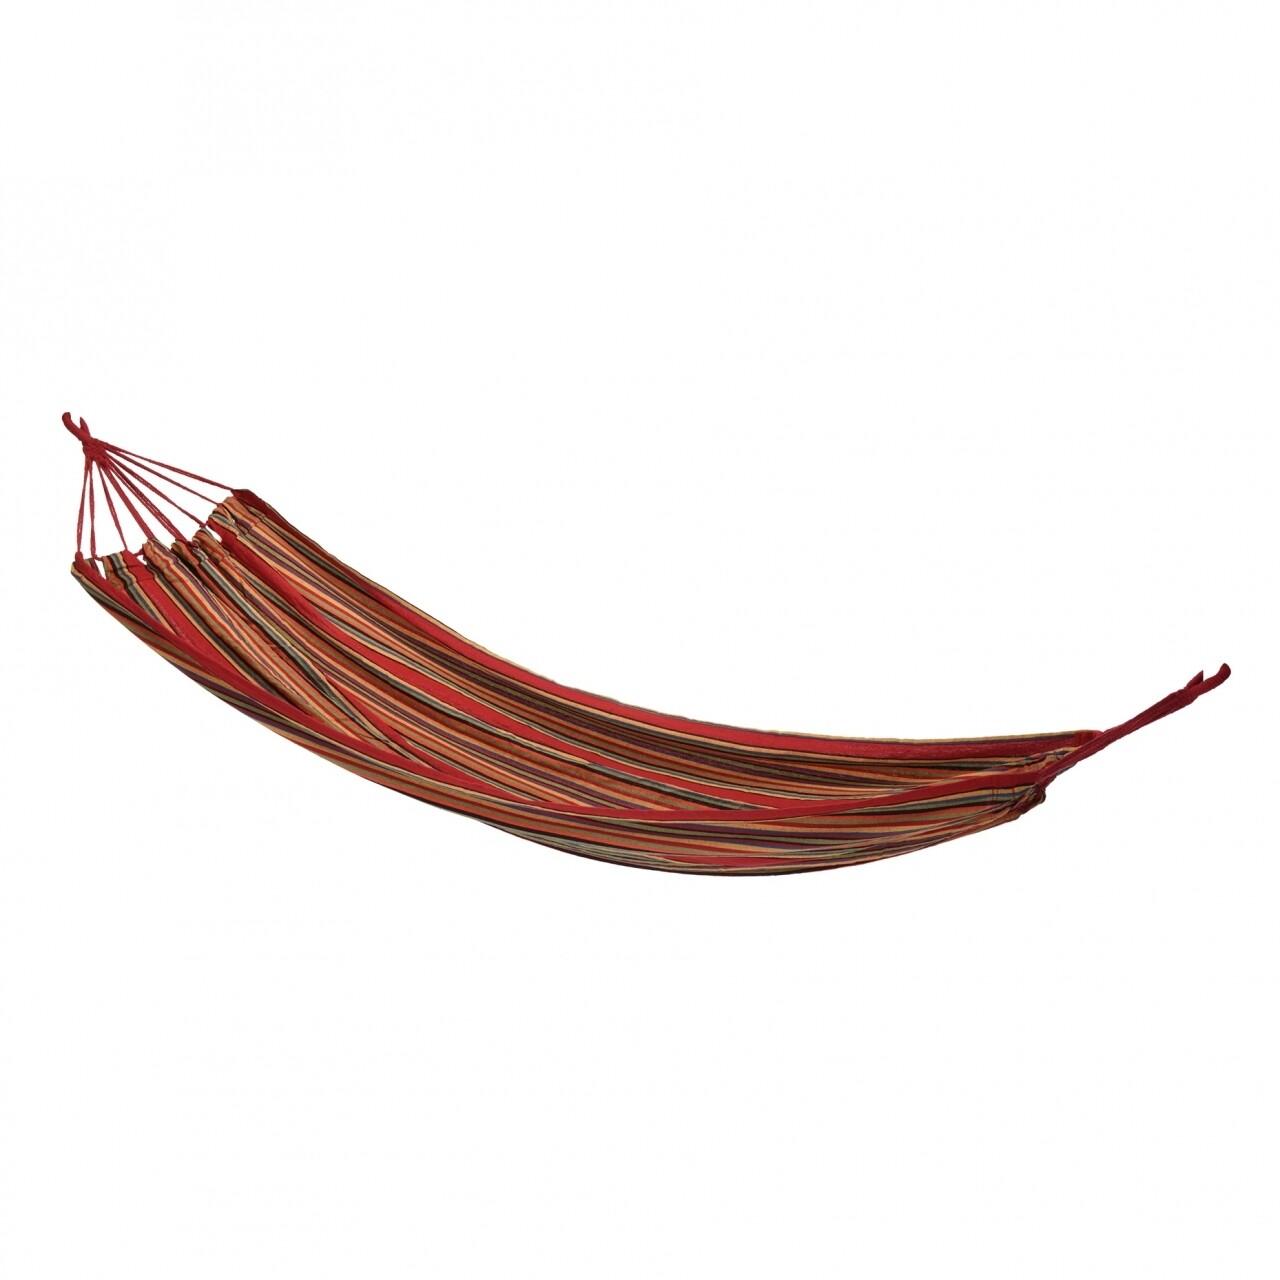 Hamac Relax, 200 x 100 cm, 60% bumbac si 40% poliester, rosu/portocaliu